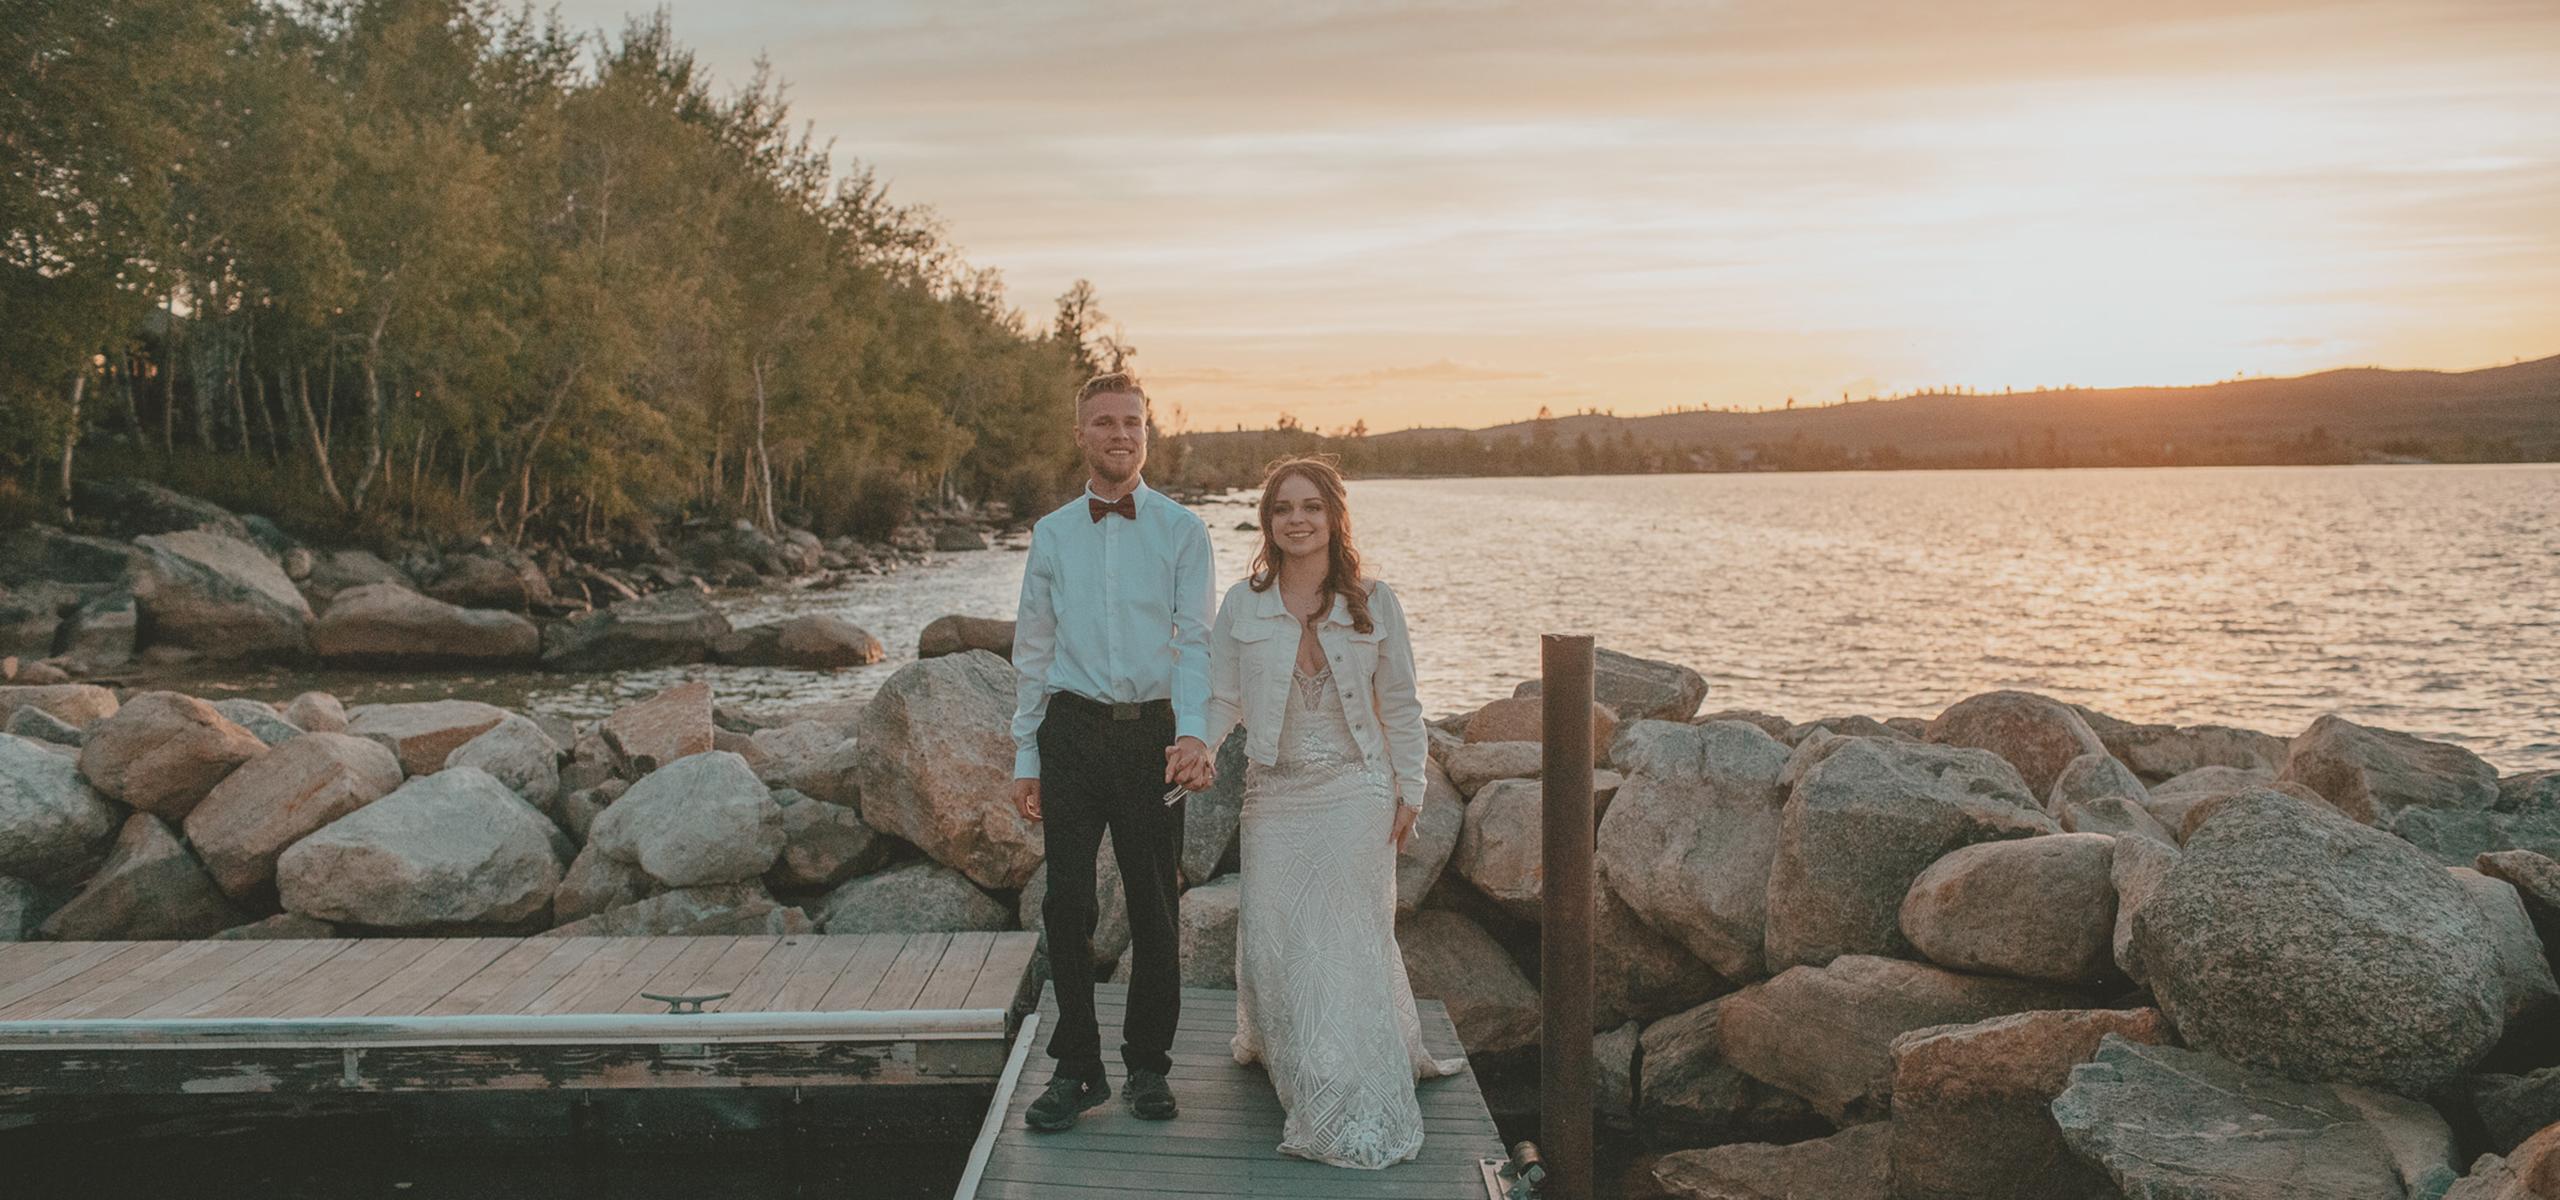 Casper Wyoming Wedding Photography + Elopement Photography.